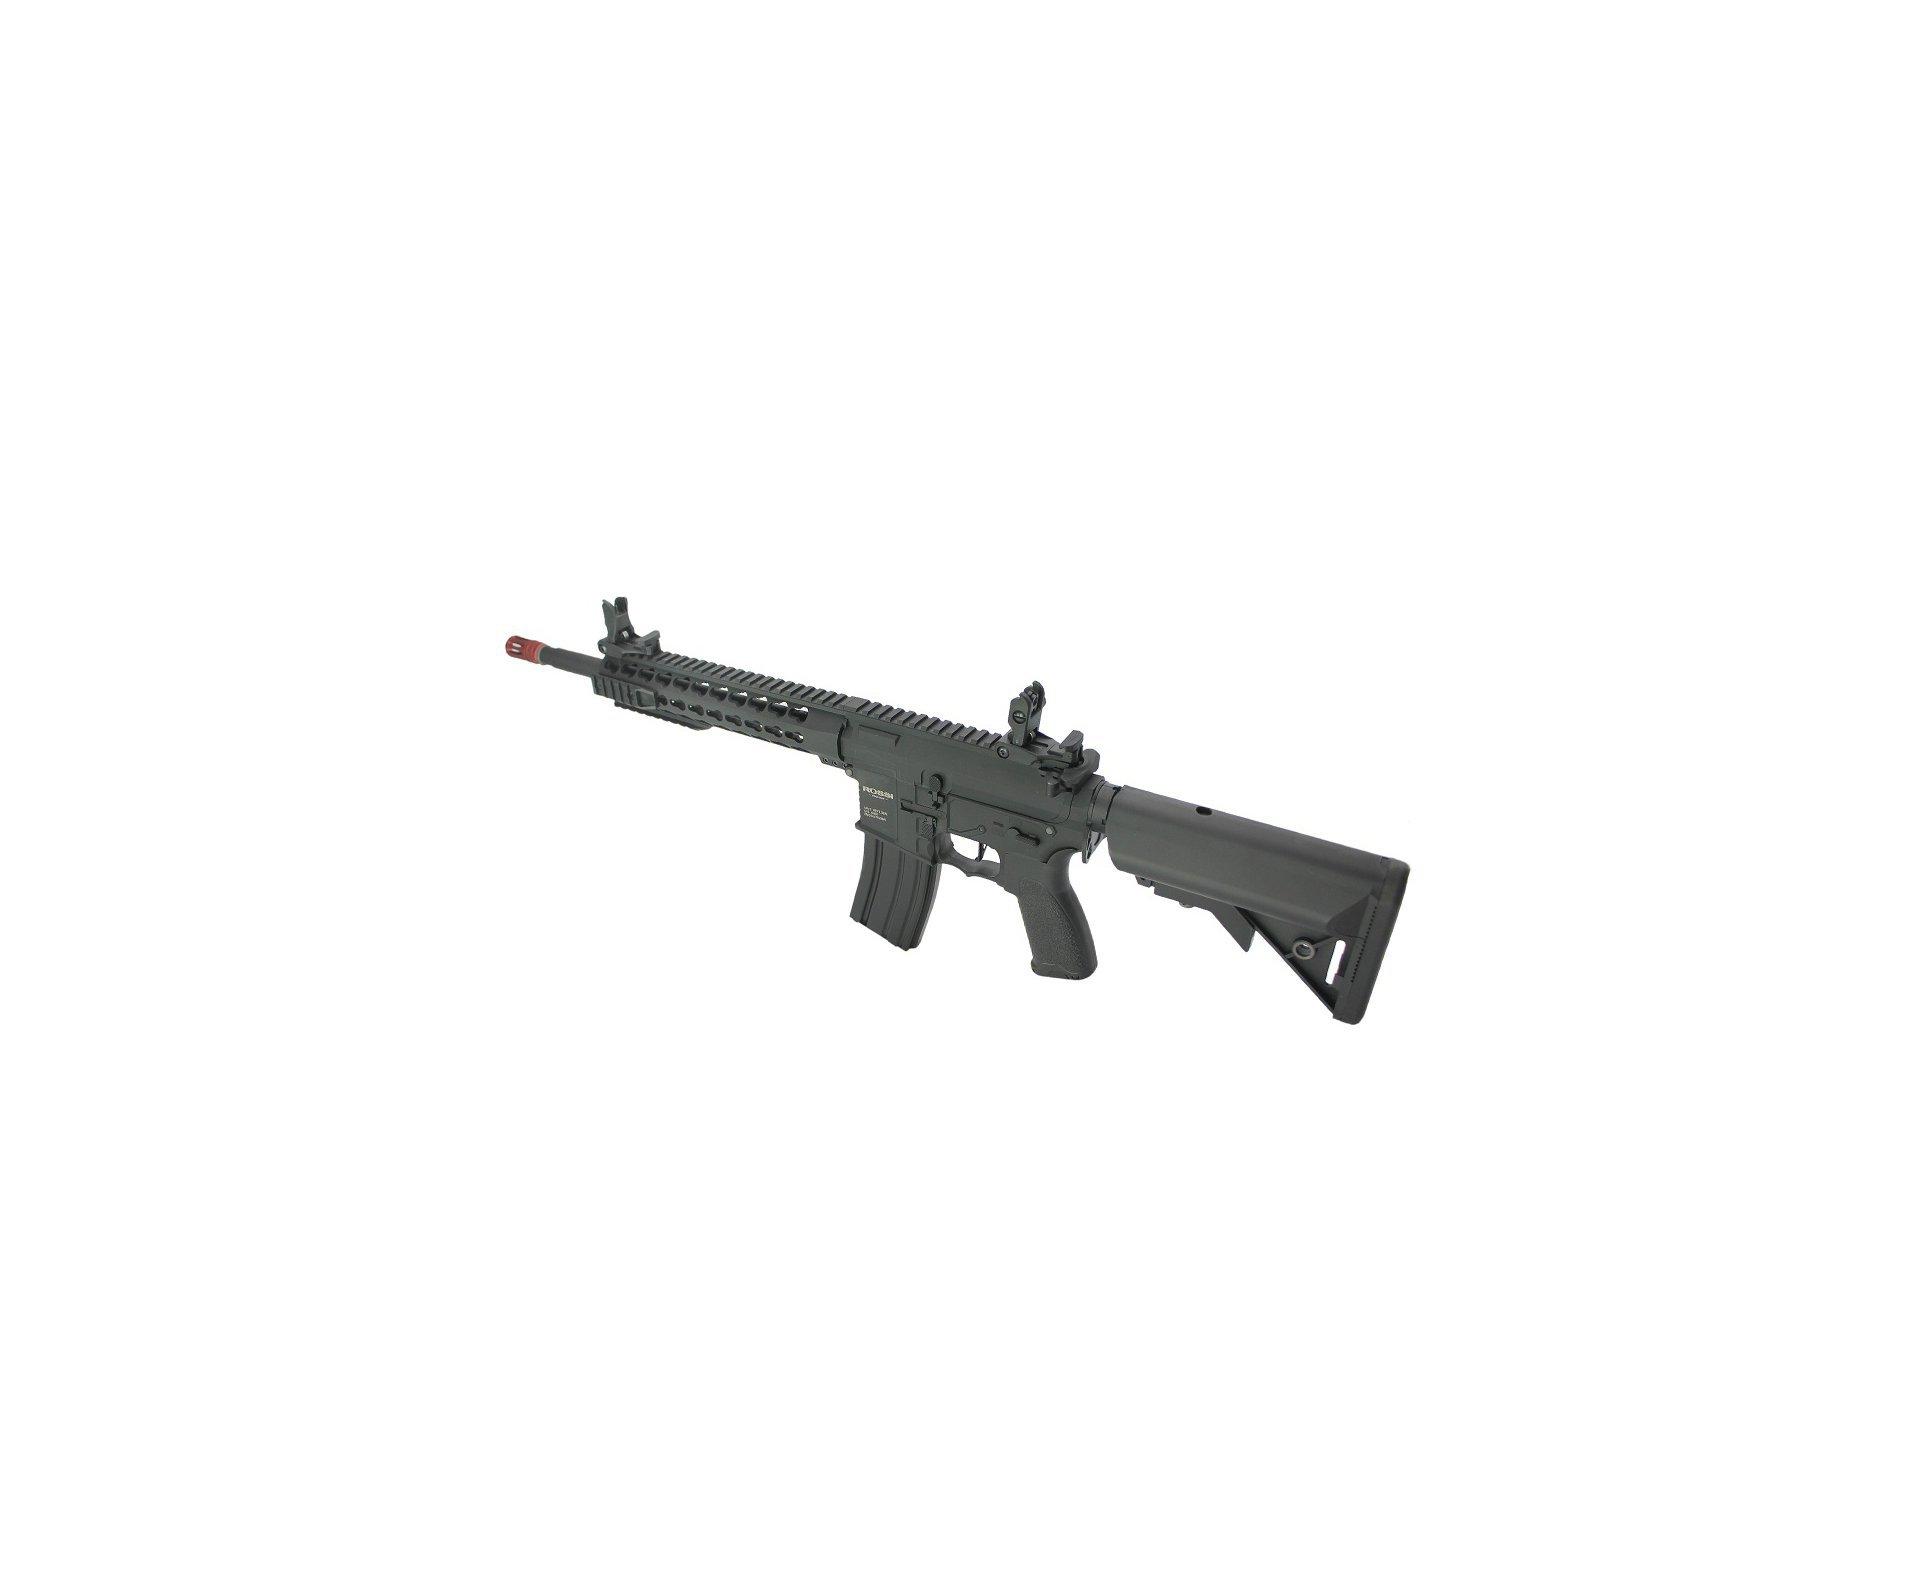 "Rifle De Airsoft Ar15 Neptune Full Metal Keymod 10"" Gatilho Et Elet 6mm Rossi + Capa Case + Bbs Raptor 0,30g"